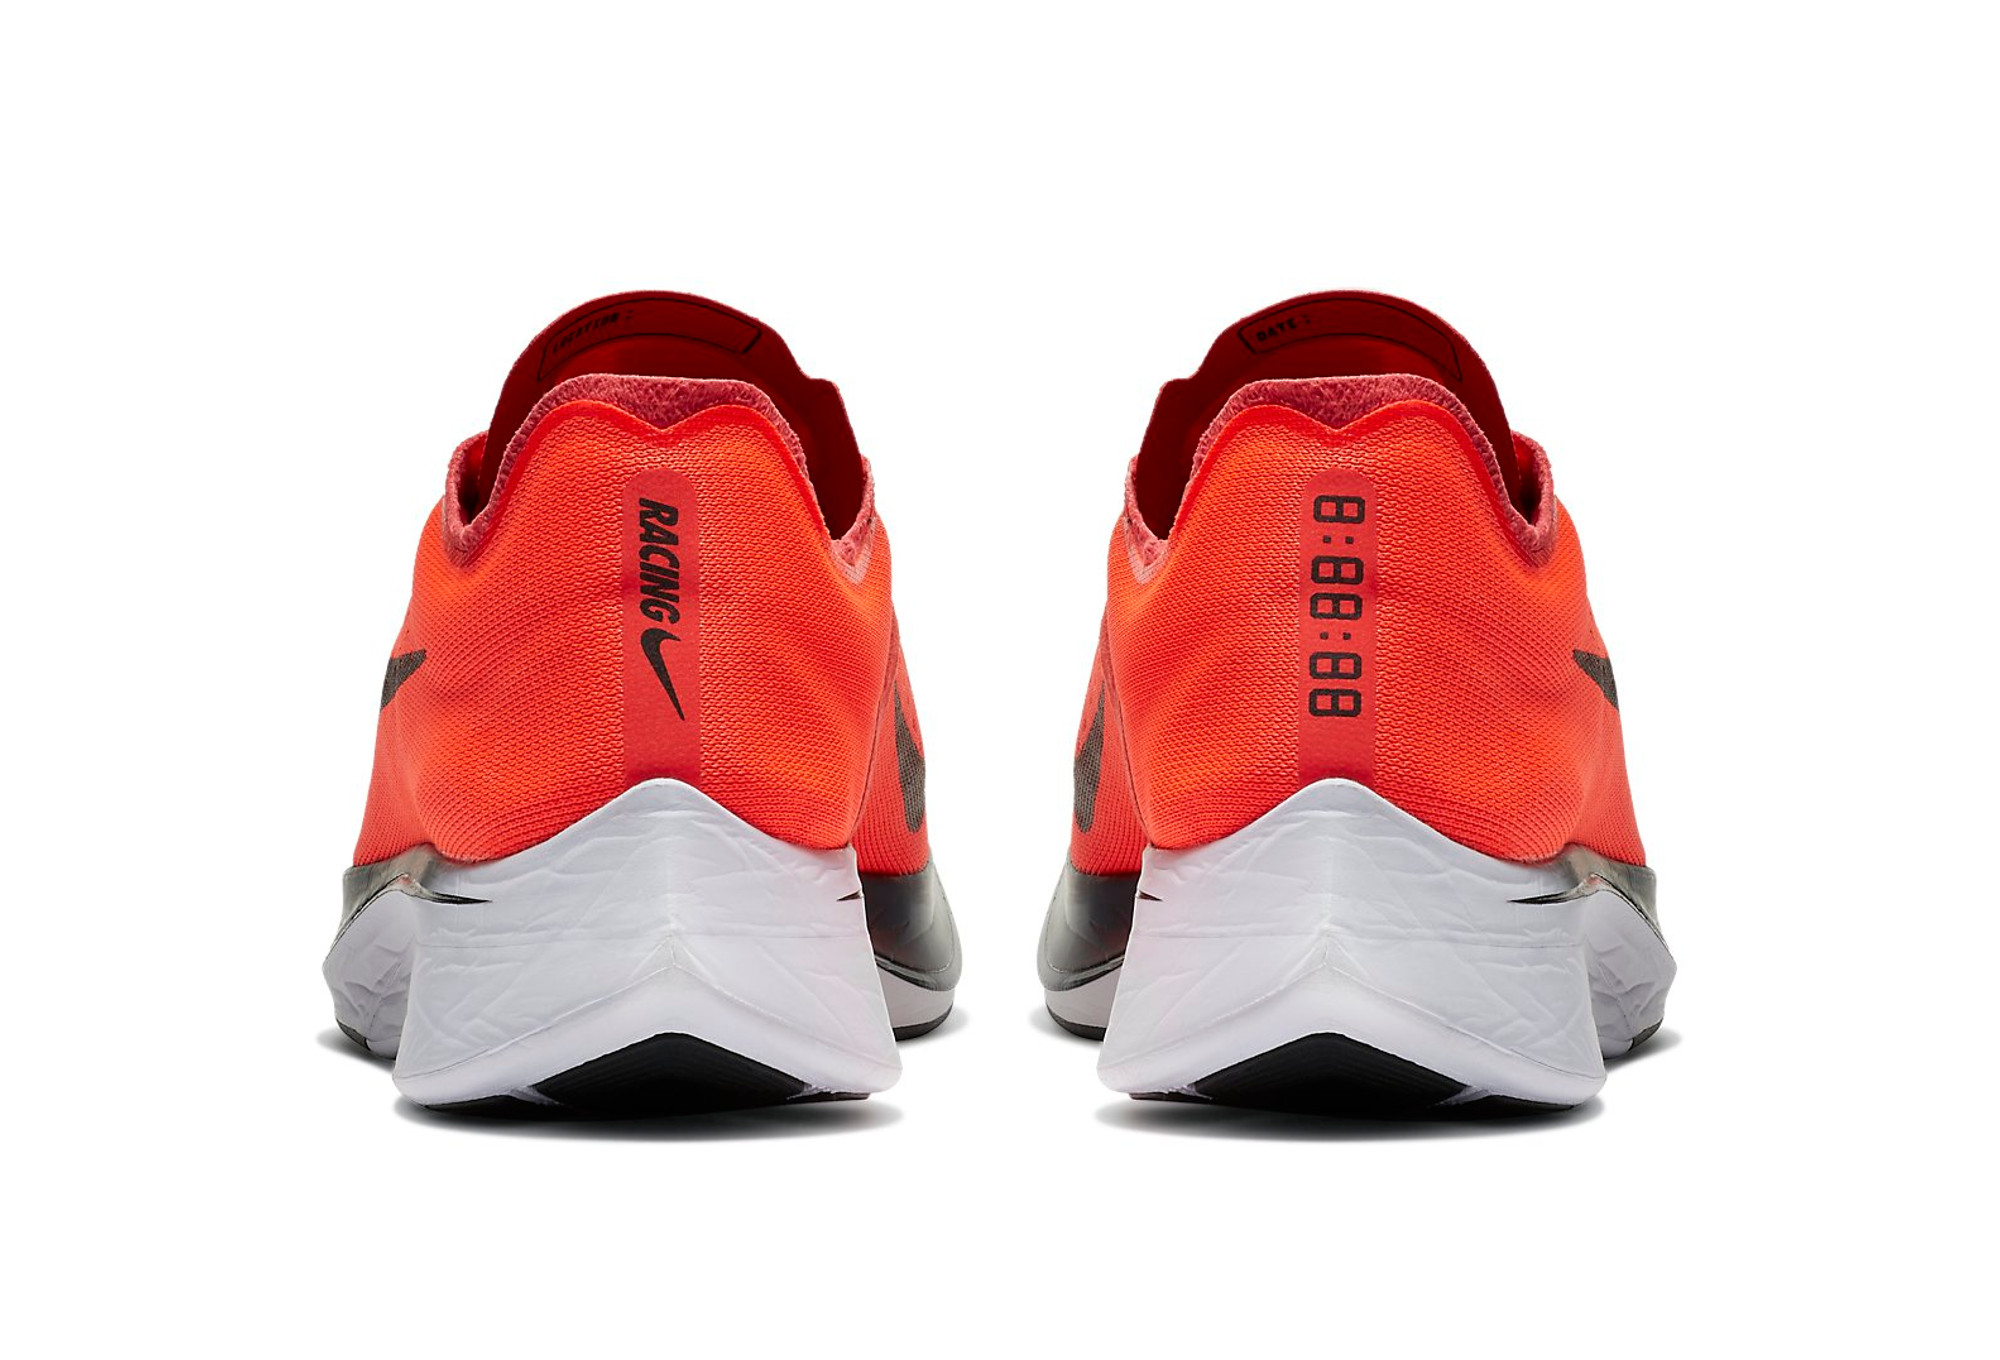 Zapatillas Nike Zoom Vaporfly 4% para Hombre